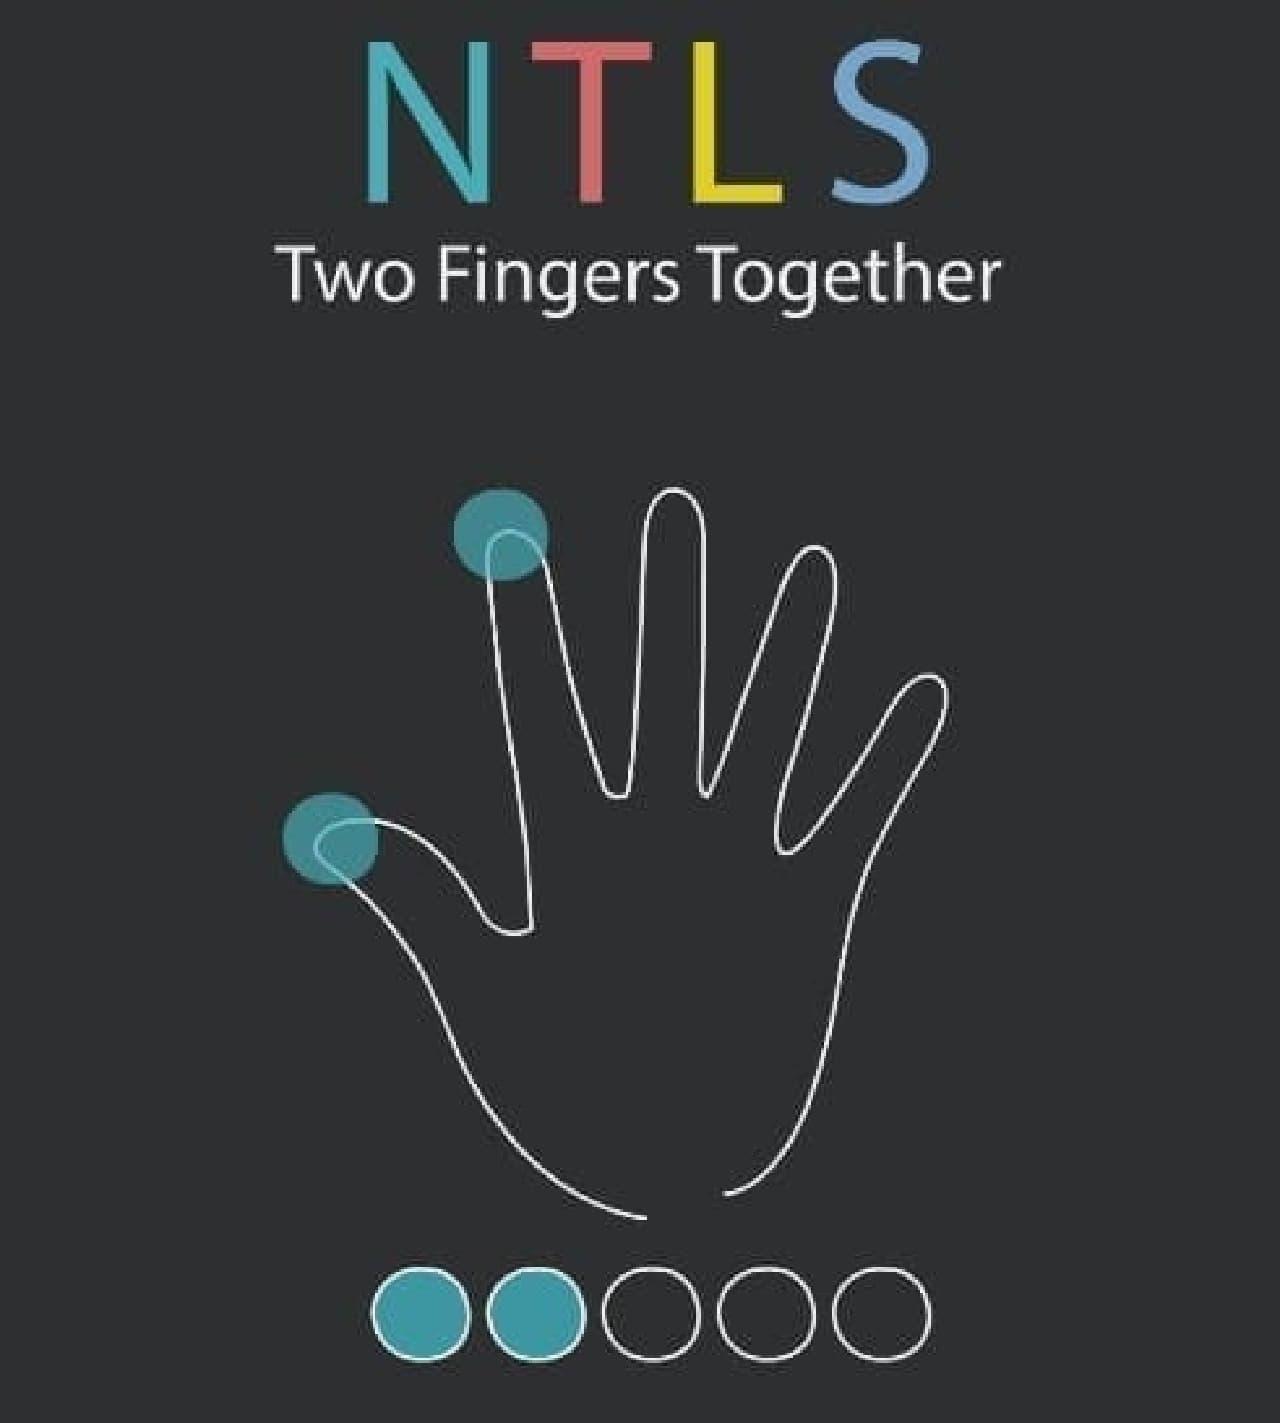 「N」を入力するには、親指と人差し指を同時にタップ